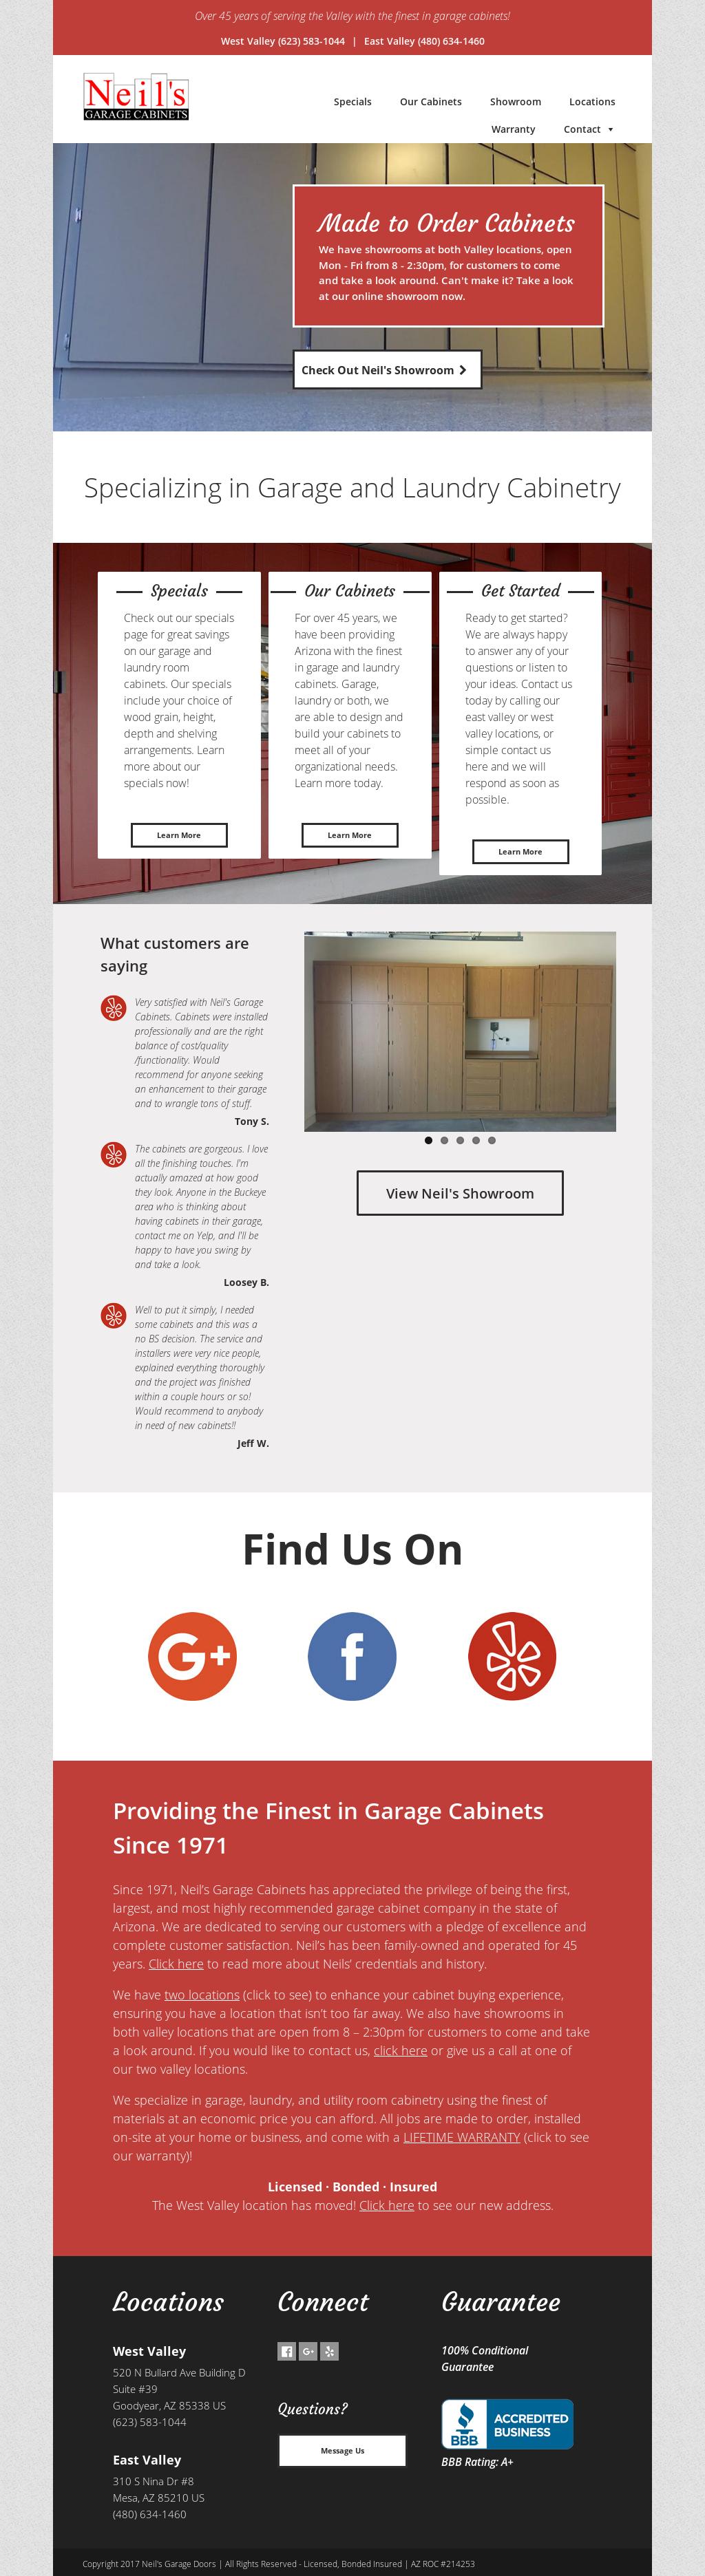 Neils Garage Cabinets Website History